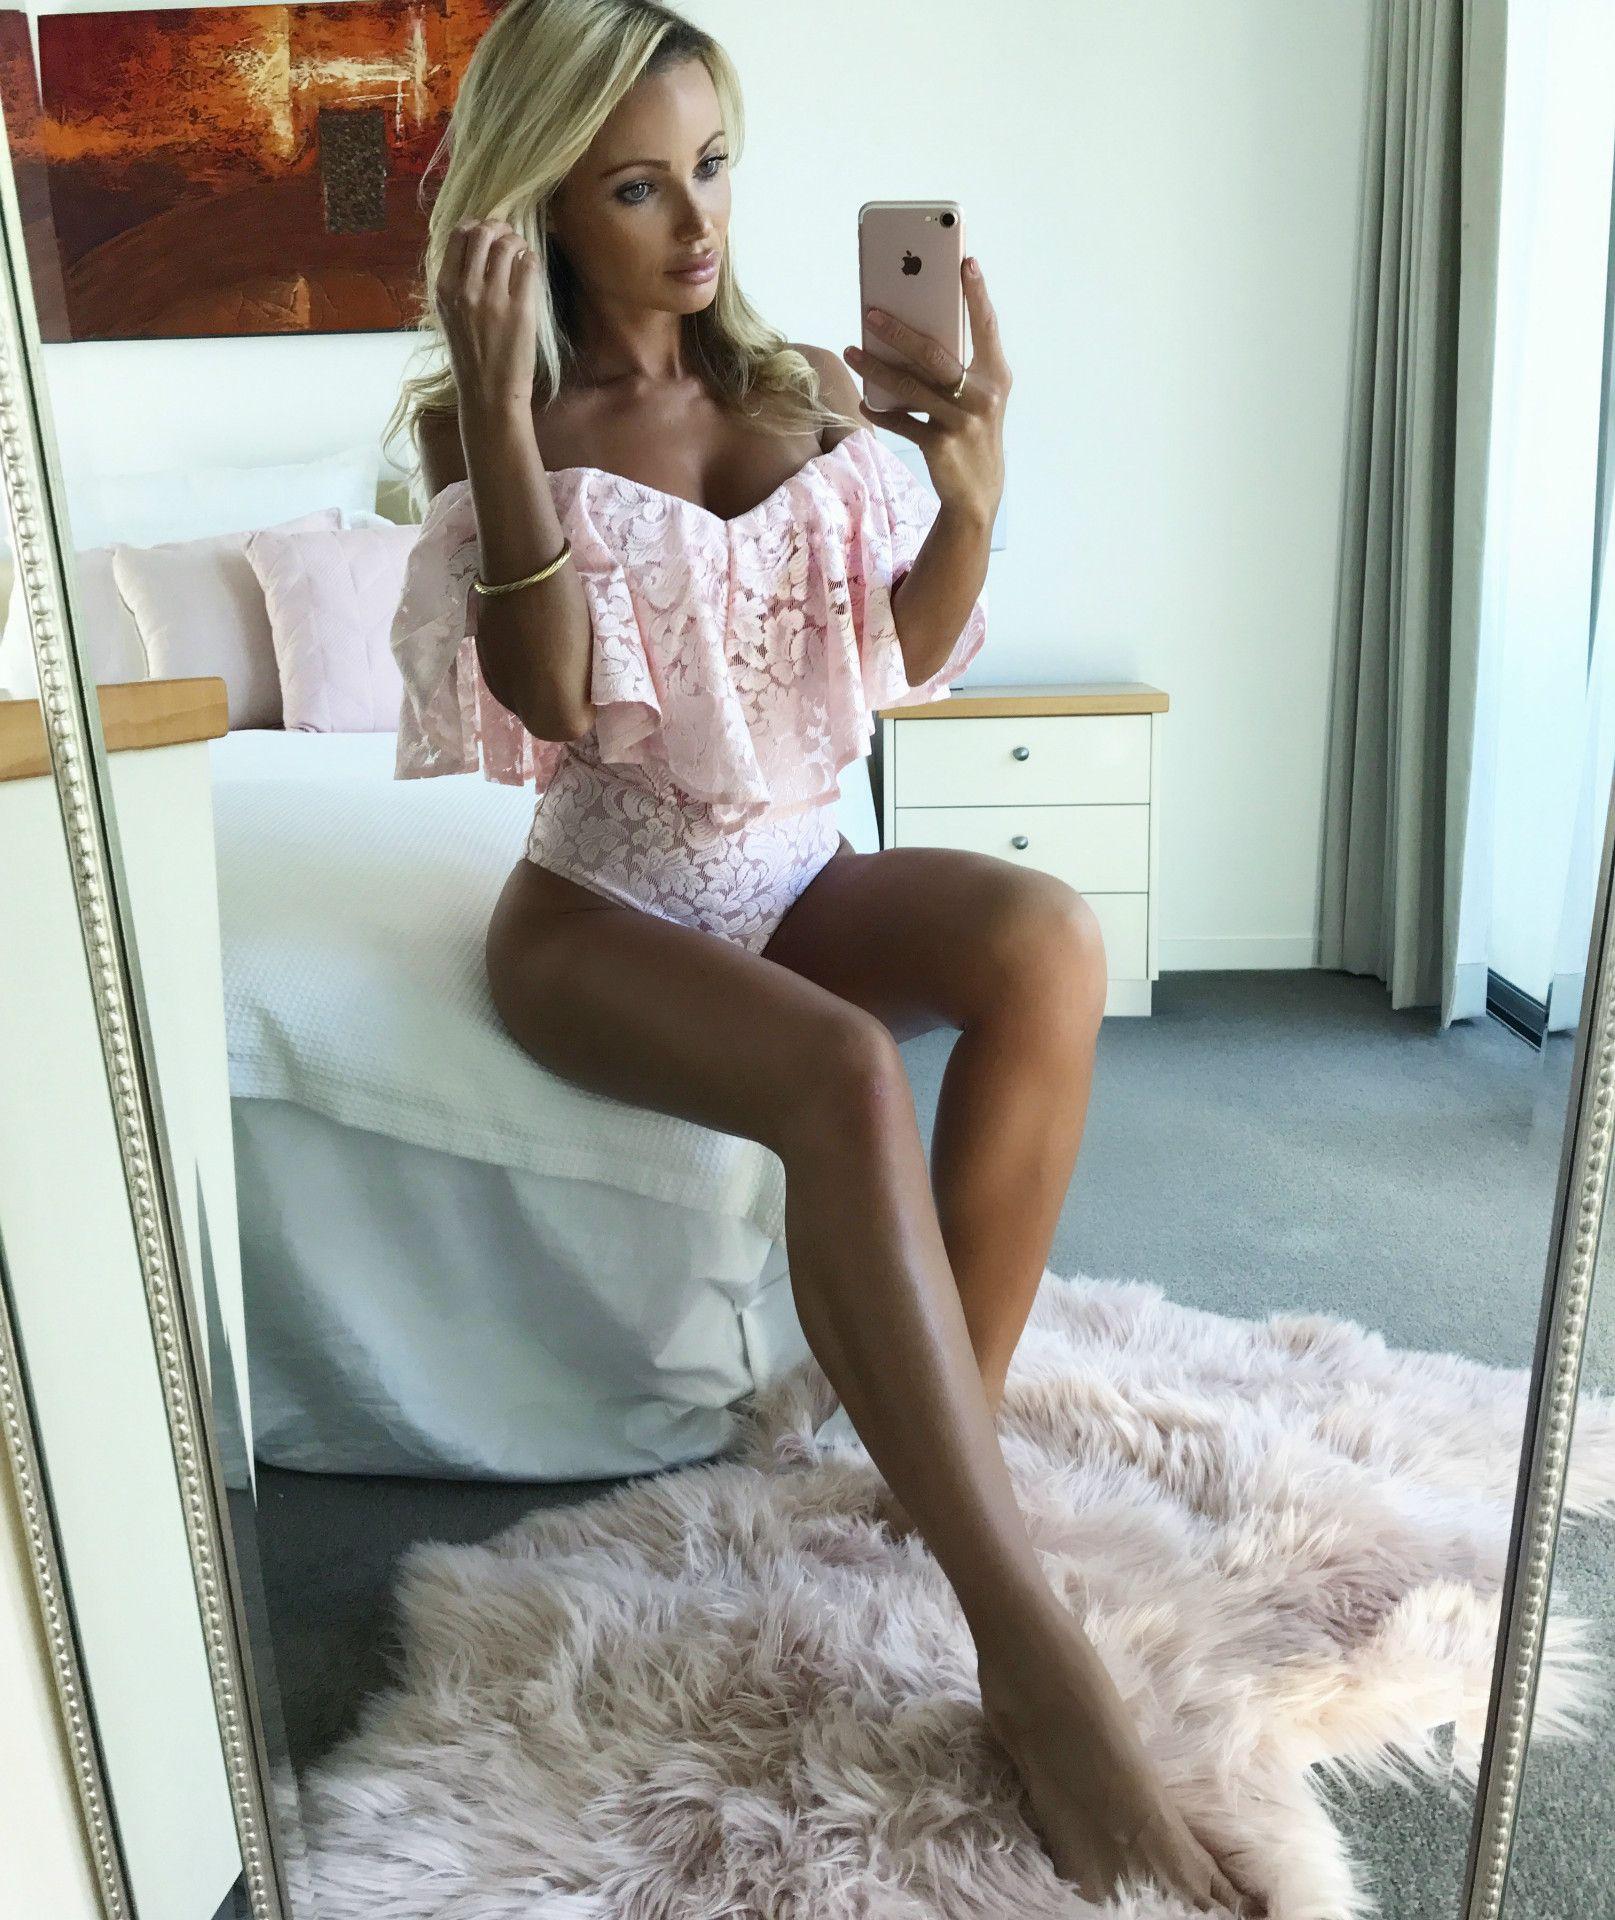 Summer Lace Floral Jumpsuits Women Slash-Neck Sleeveless Curve Ruffle Design Bodysuit High Waist Women TOP Shaper Clothing S-XL Size